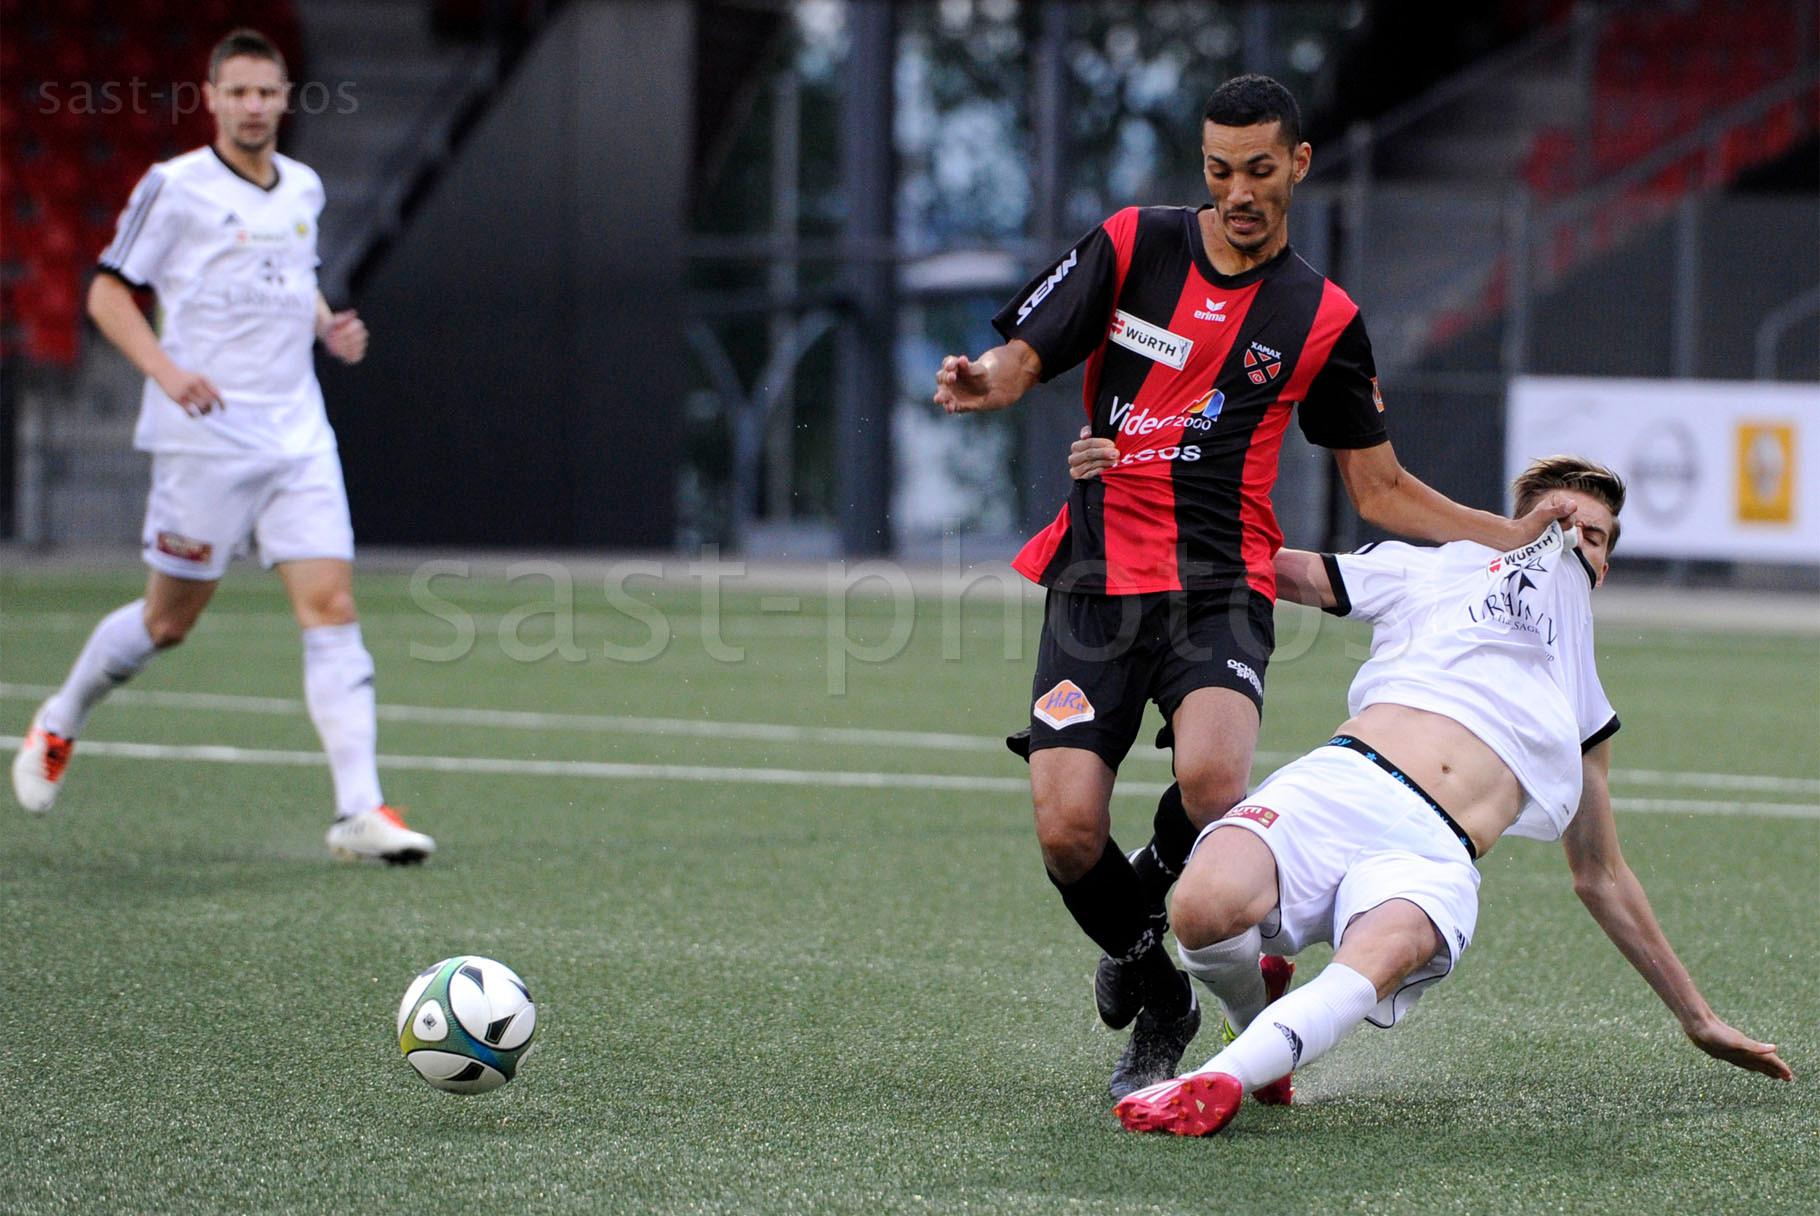 Yassine El Allaoui (L. Xamax FCS) gegen Alexandre Infante (Carouge)